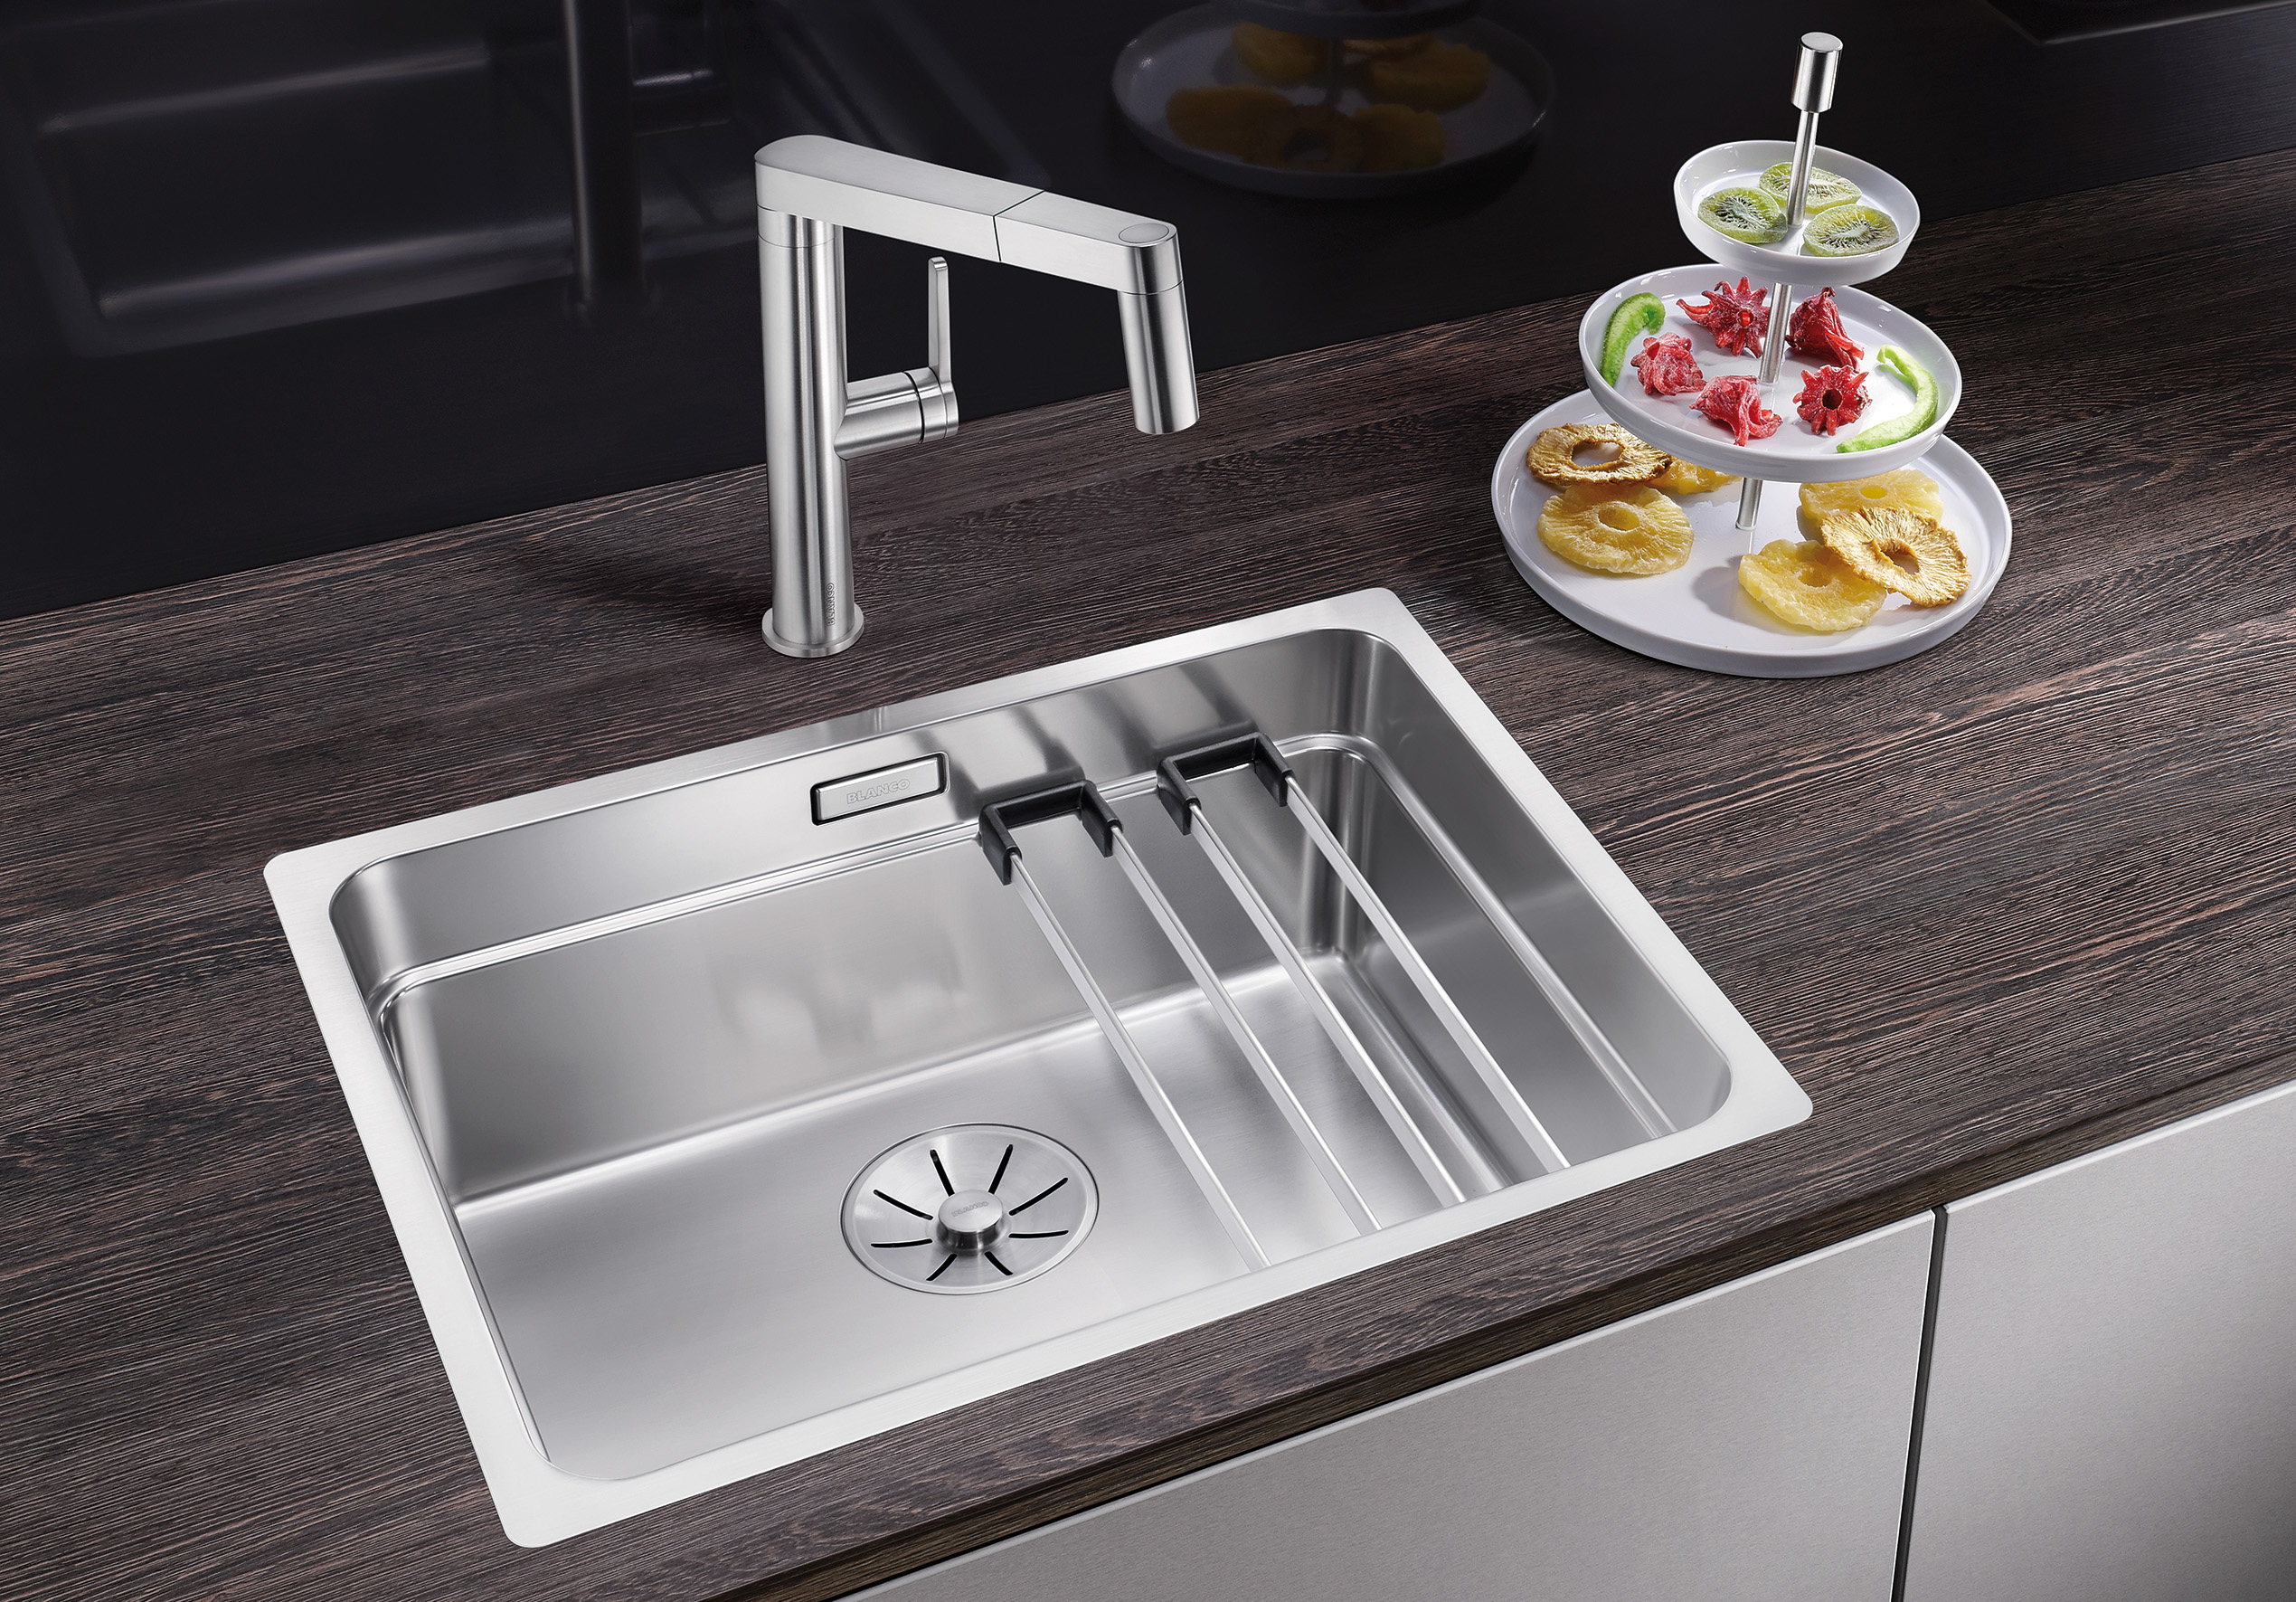 New Stainless Steel And Silgranit Blanco Etagon Three Tier Sink System Umaxo Com